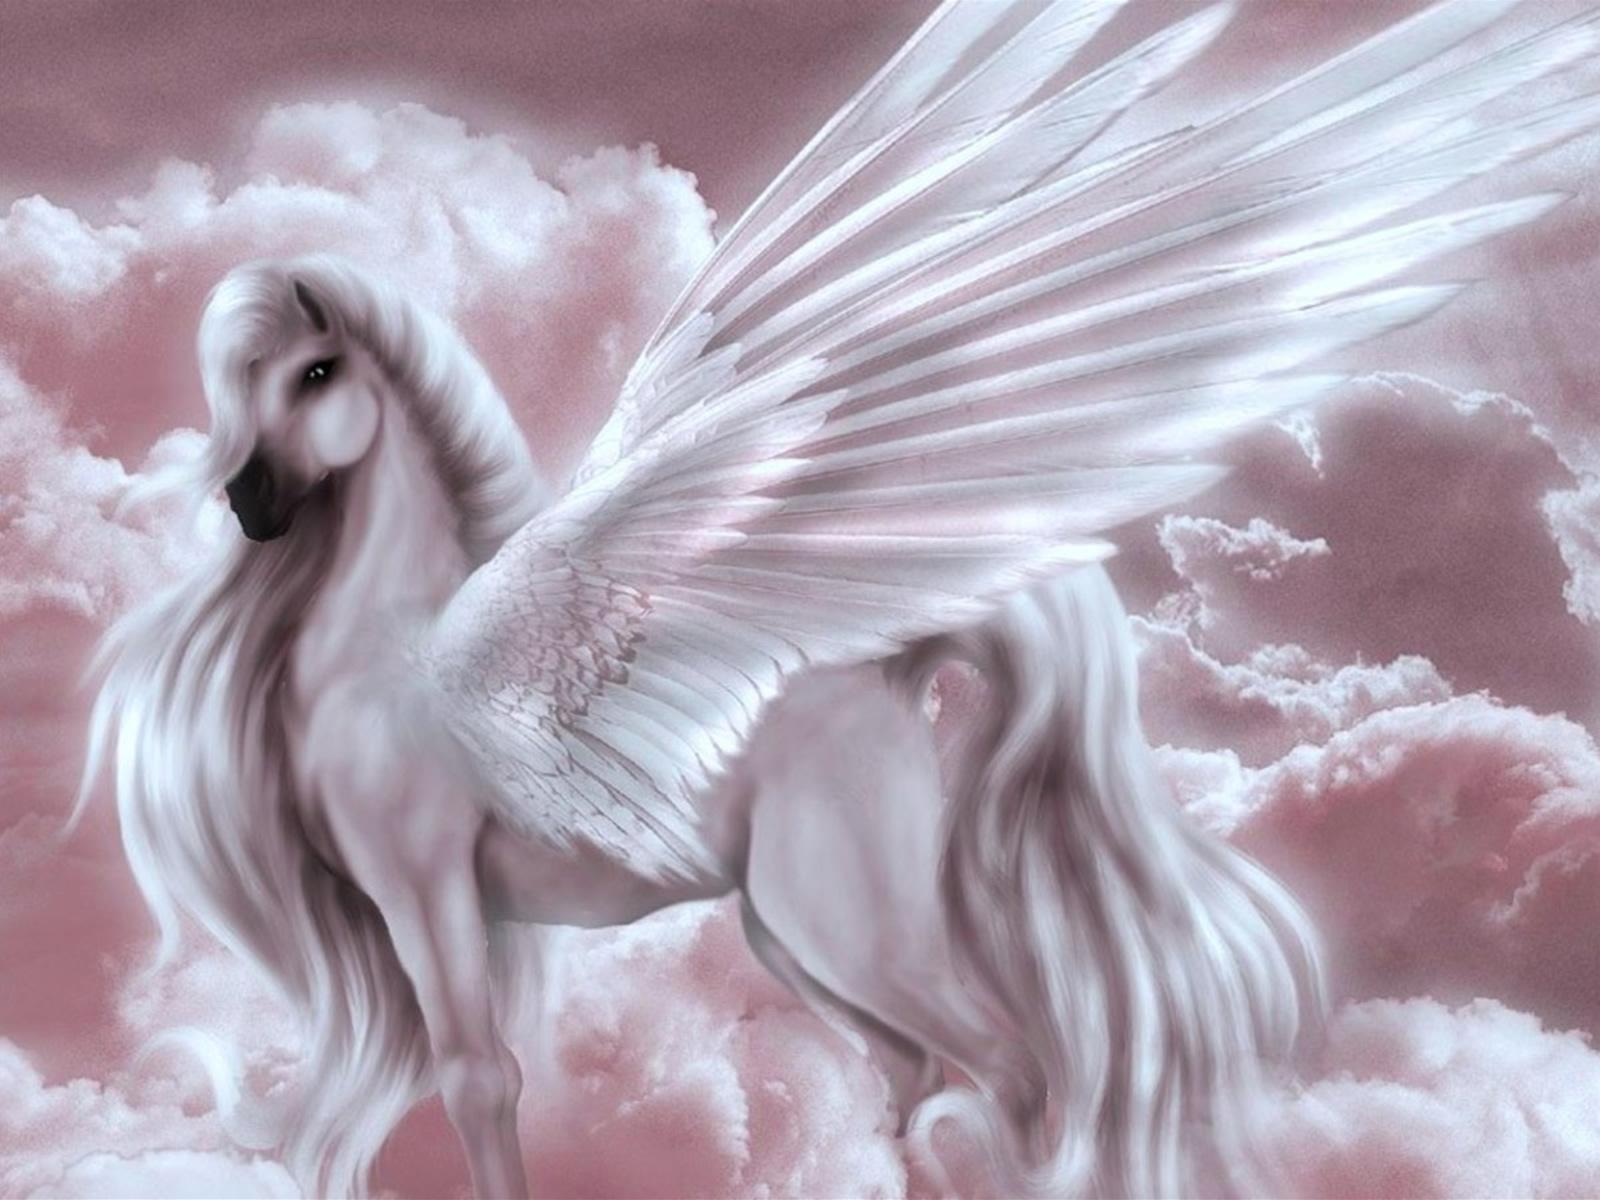 http://www.defondos.com/bulkupload/unicornios-fotos/Fantasia/Unicornios/Unicornio%20Principe.jpg